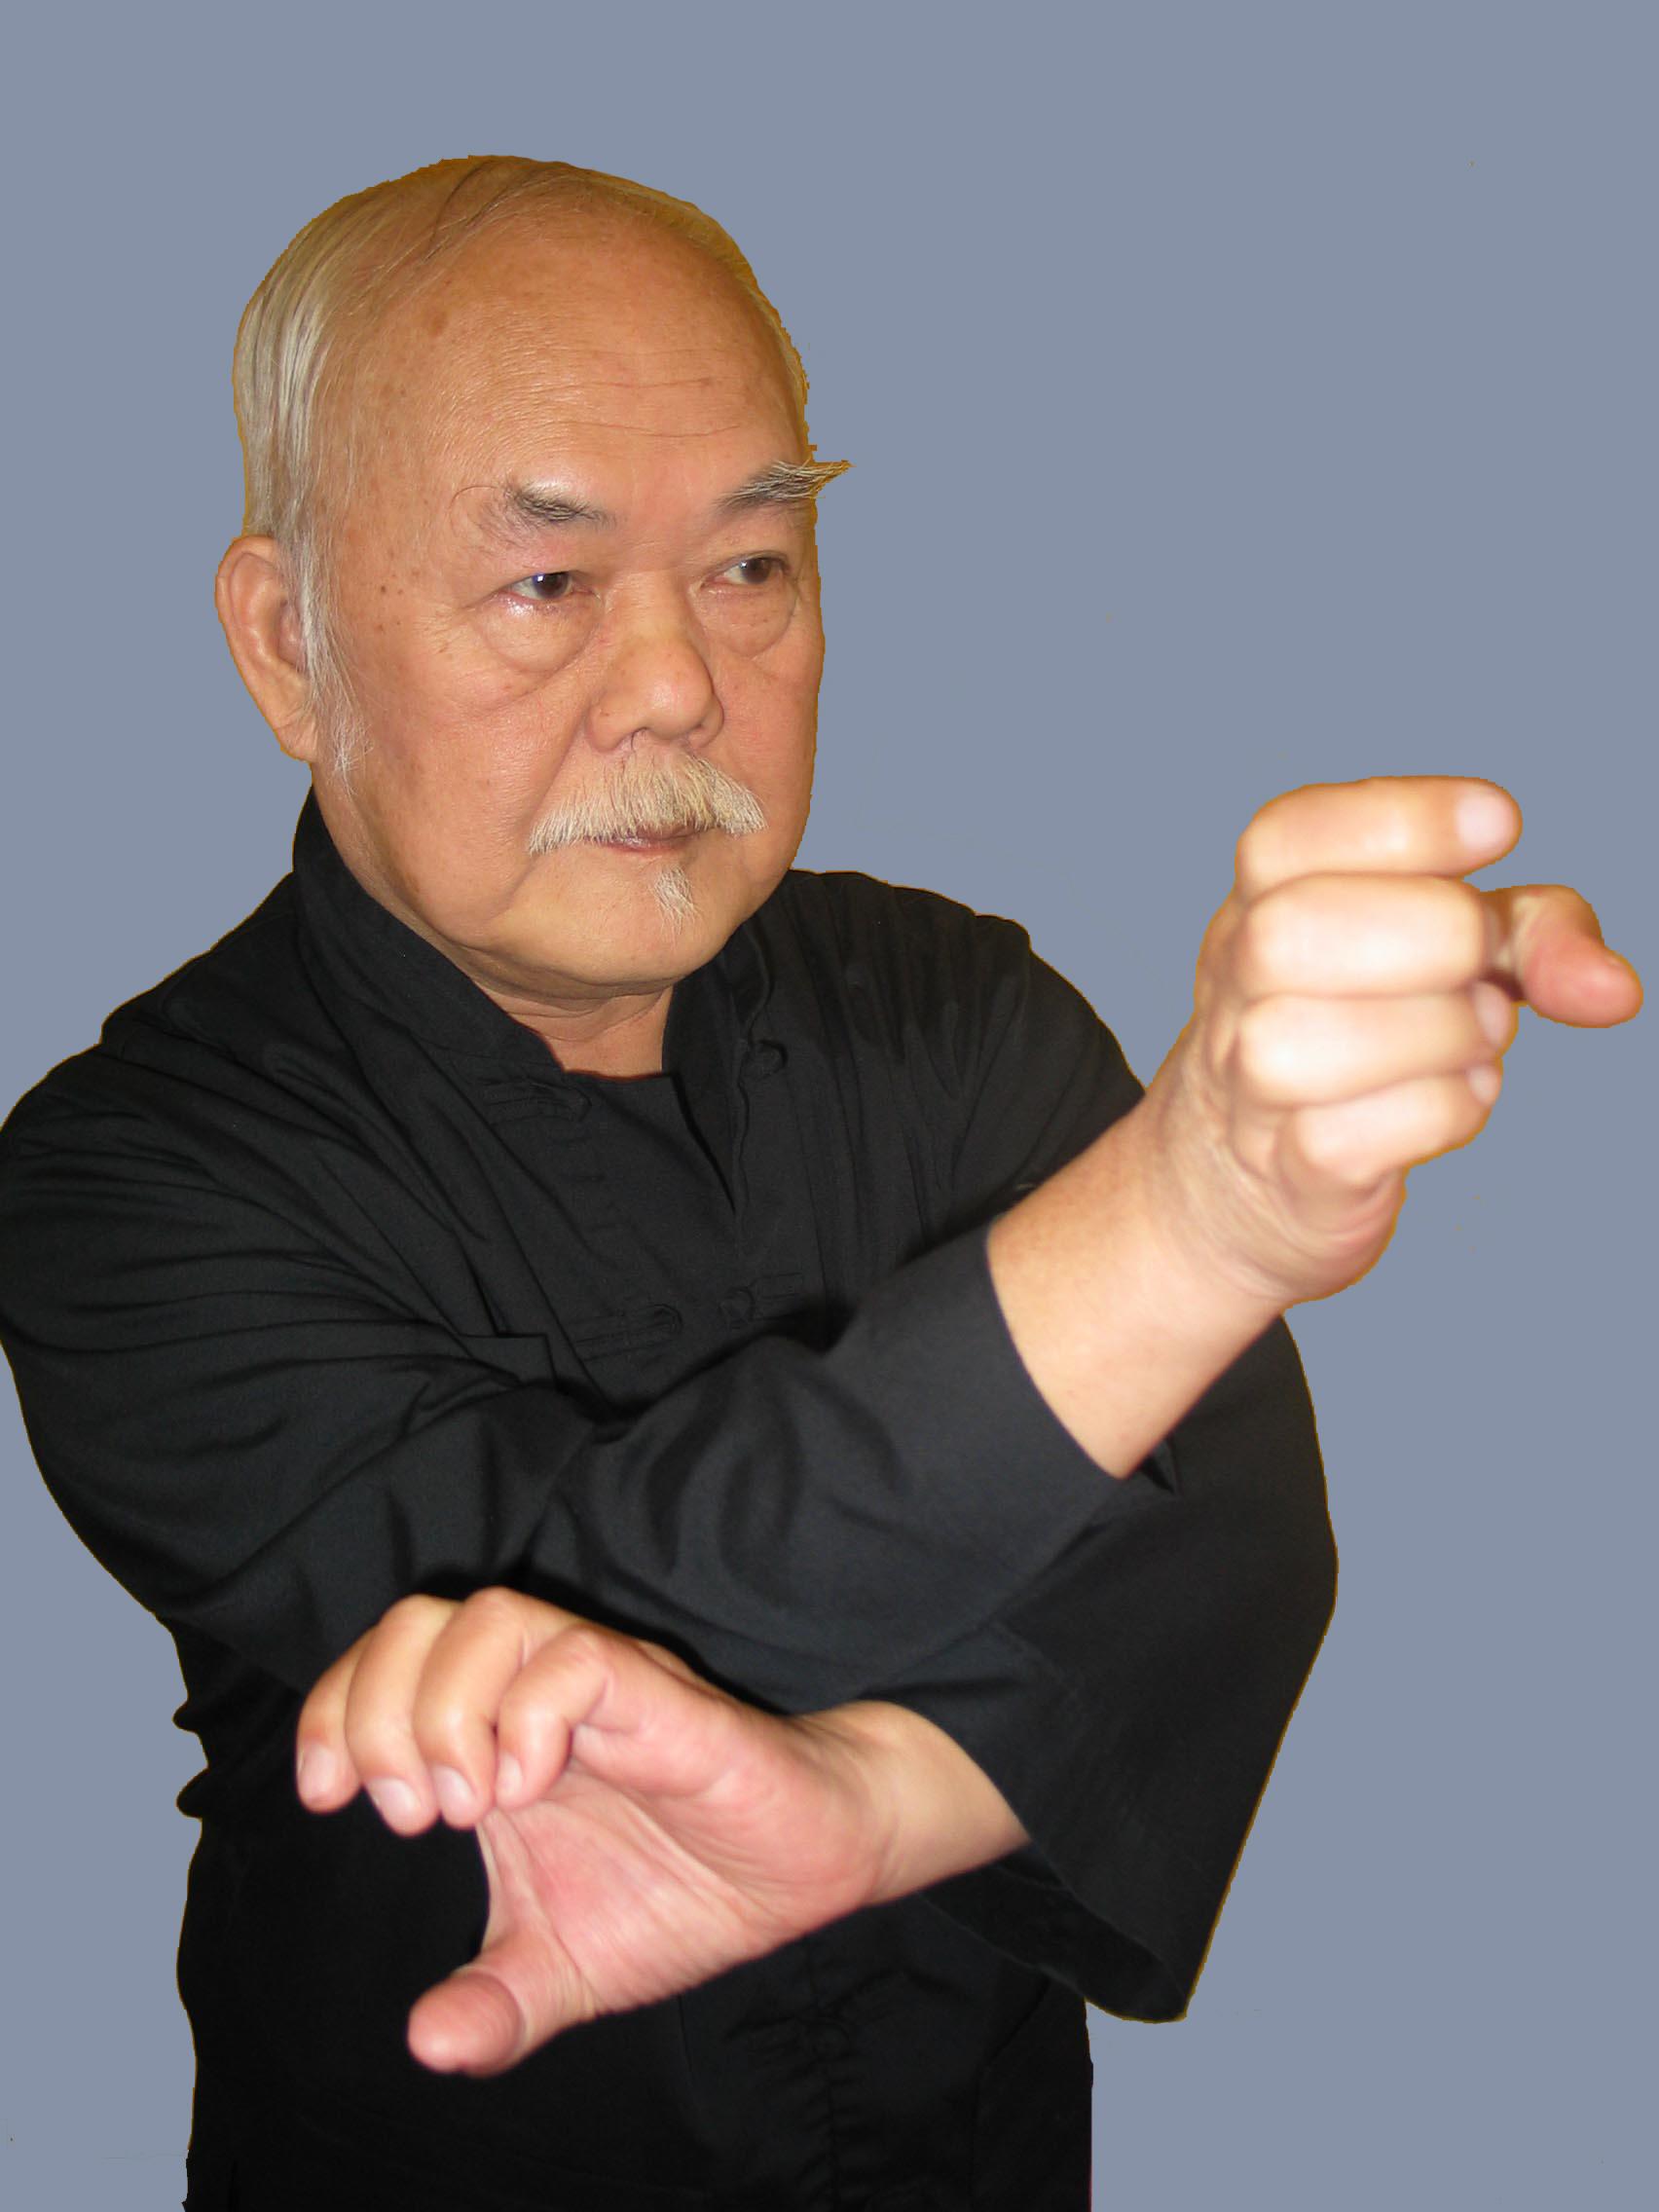 leung shum